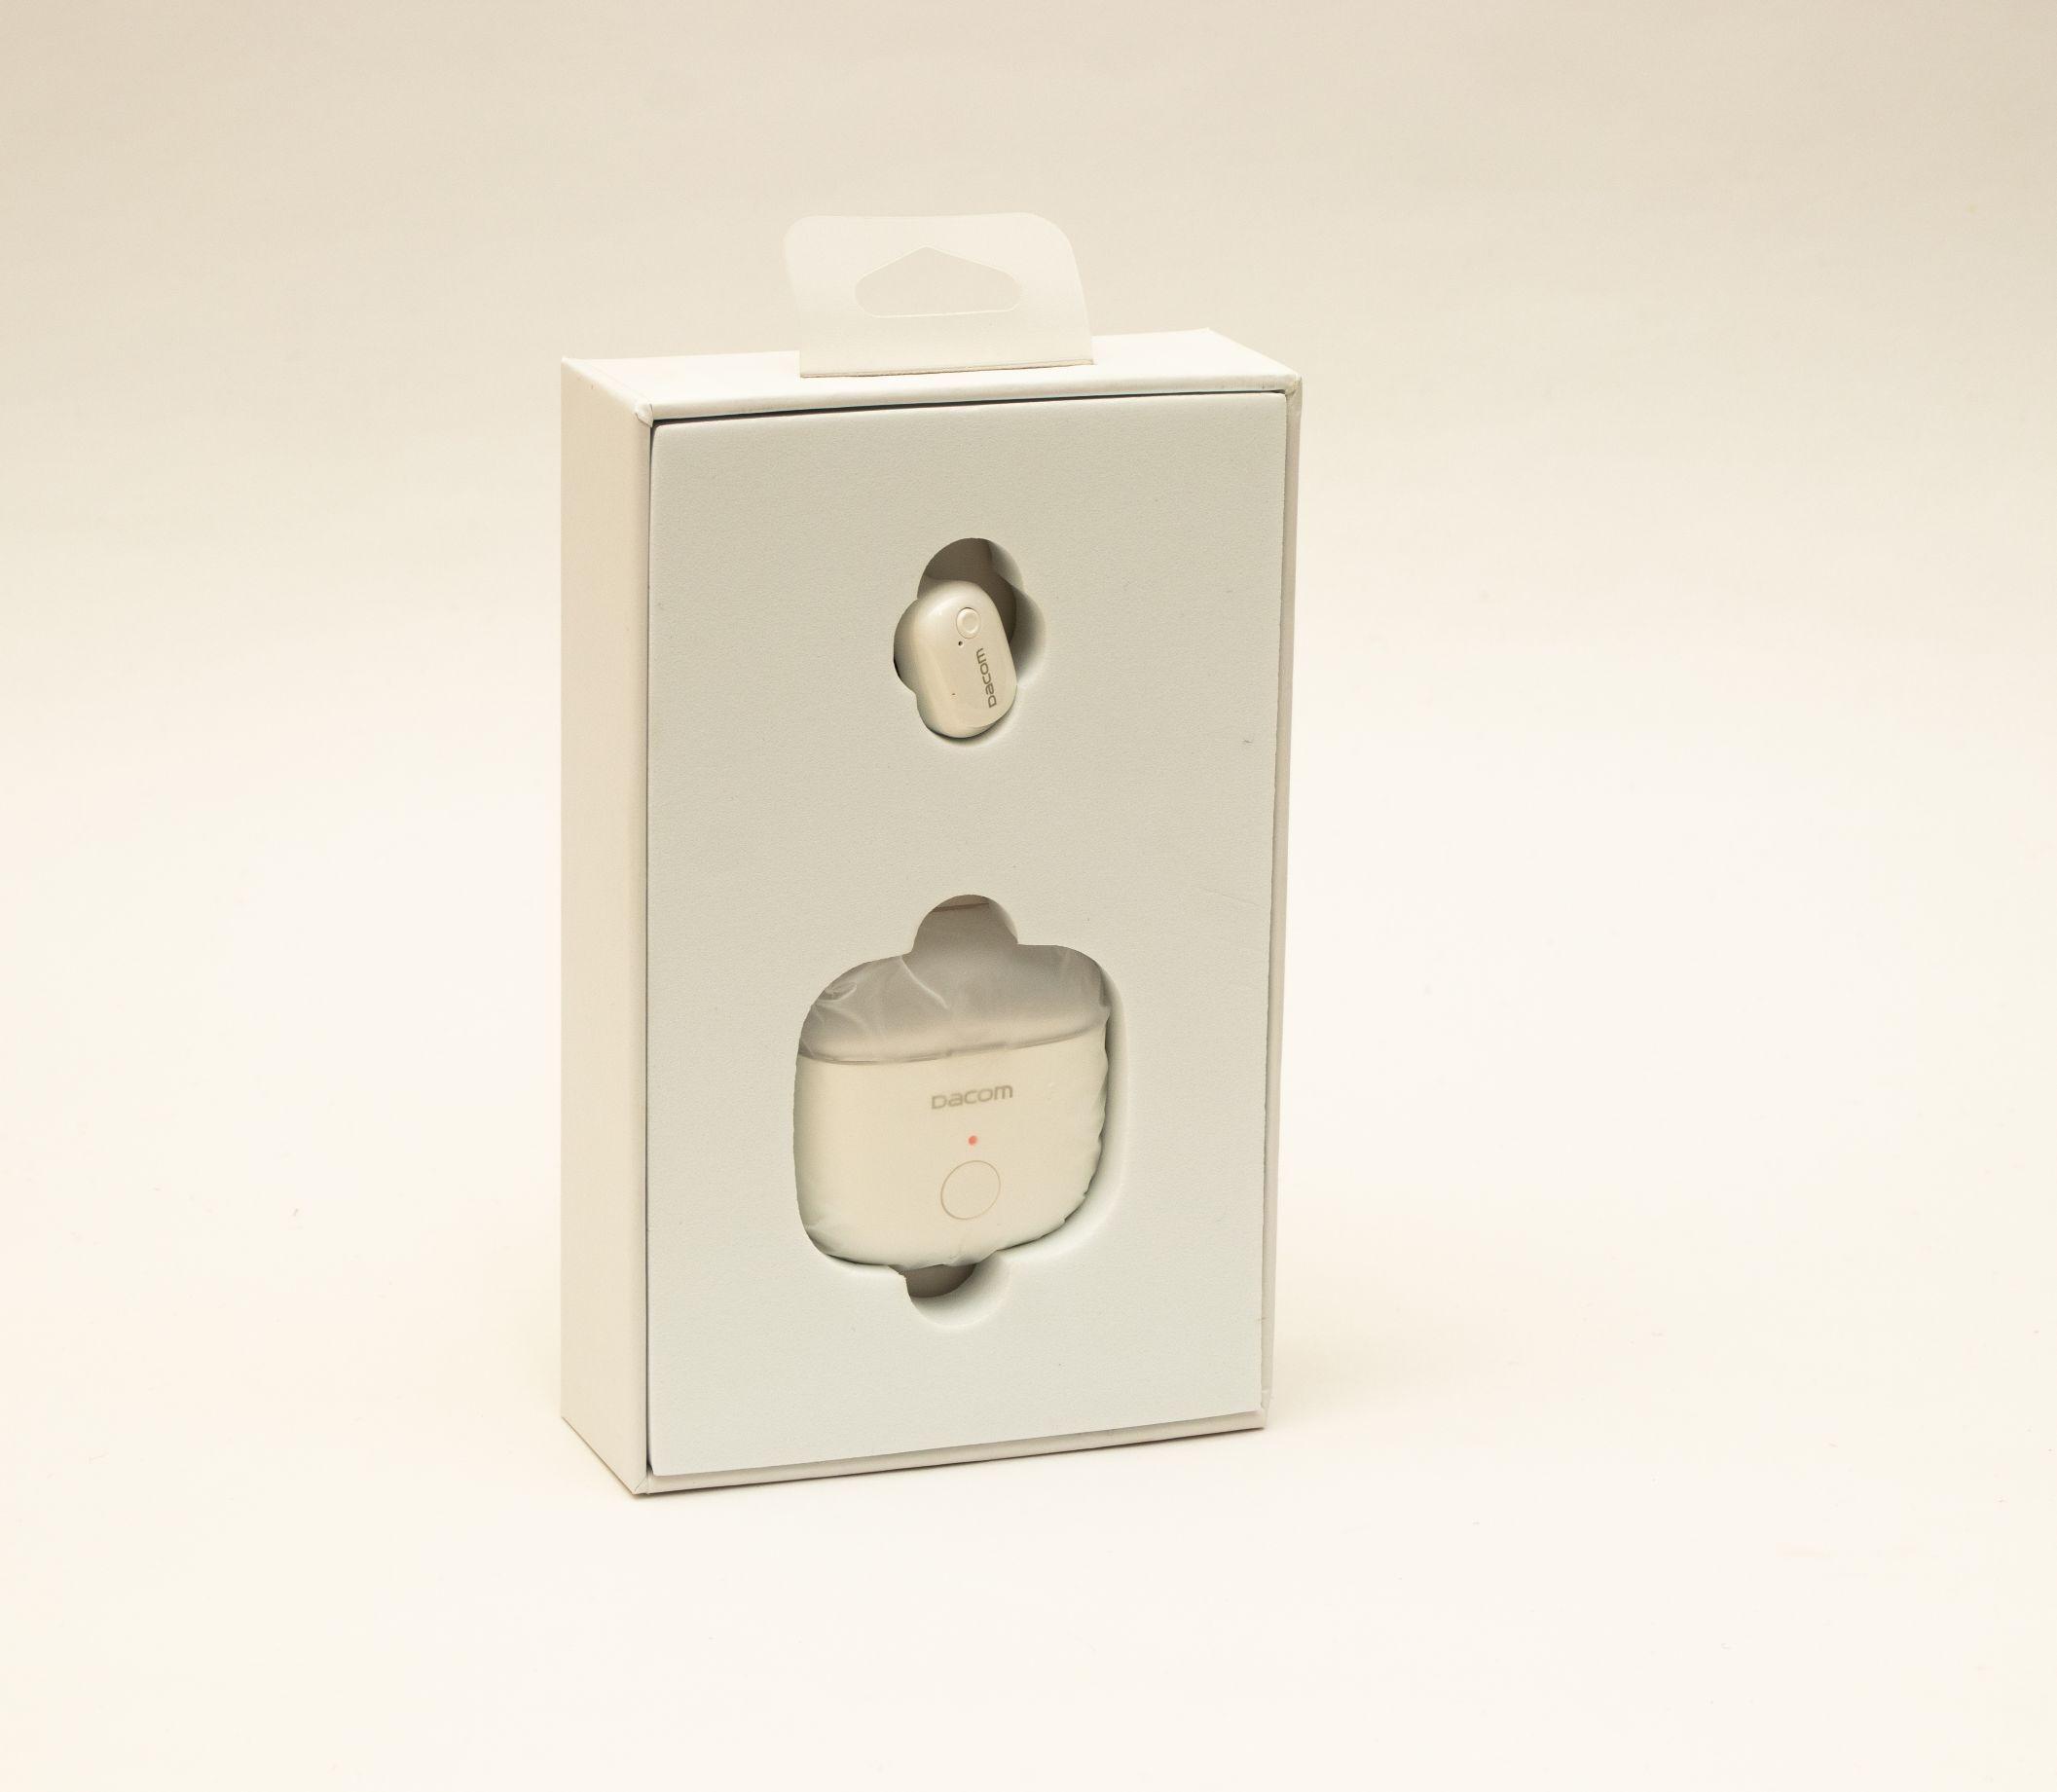 Earbuds Dacom One Ear K6p White بسعر 520ج بدل من 675ج Phone Accessories Phone Phone Ring